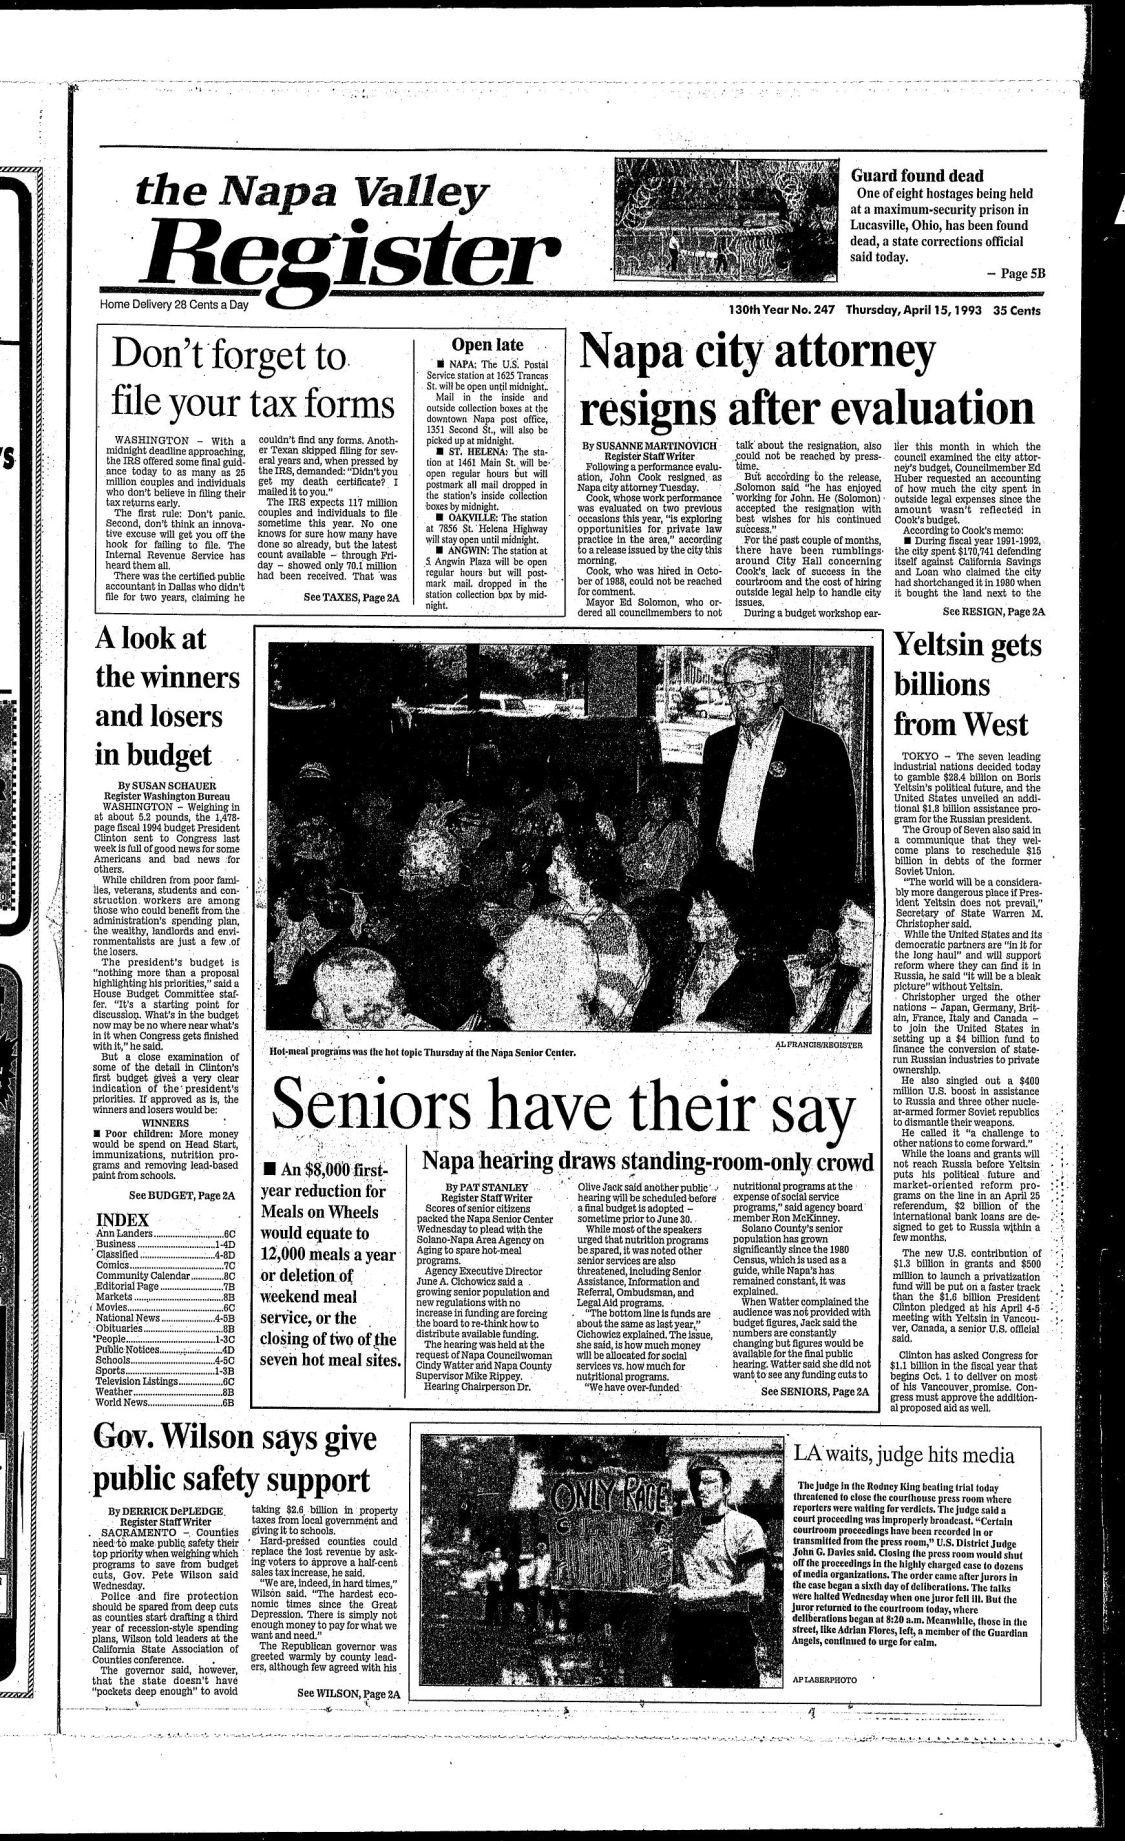 April 15, 1993